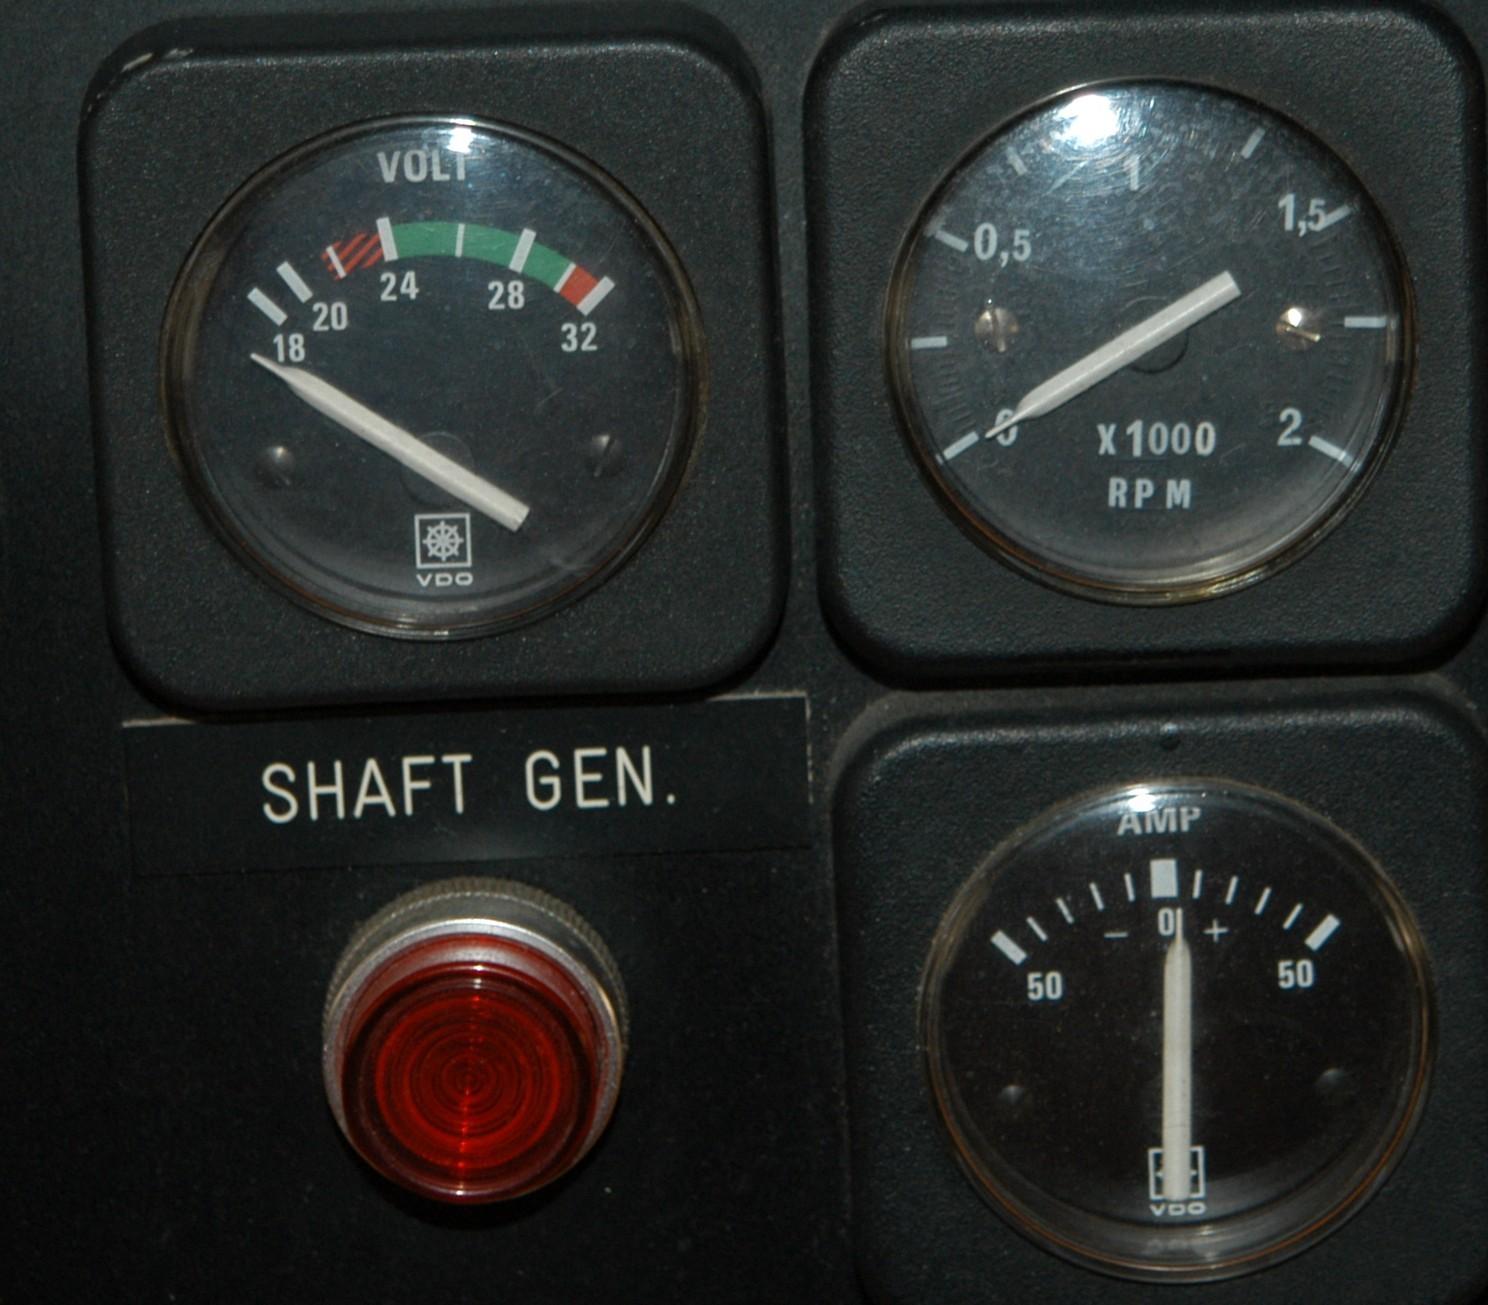 Click image for larger version  Name:Shaft Gen Panel.jpg Views:190 Size:329.1 KB ID:51176